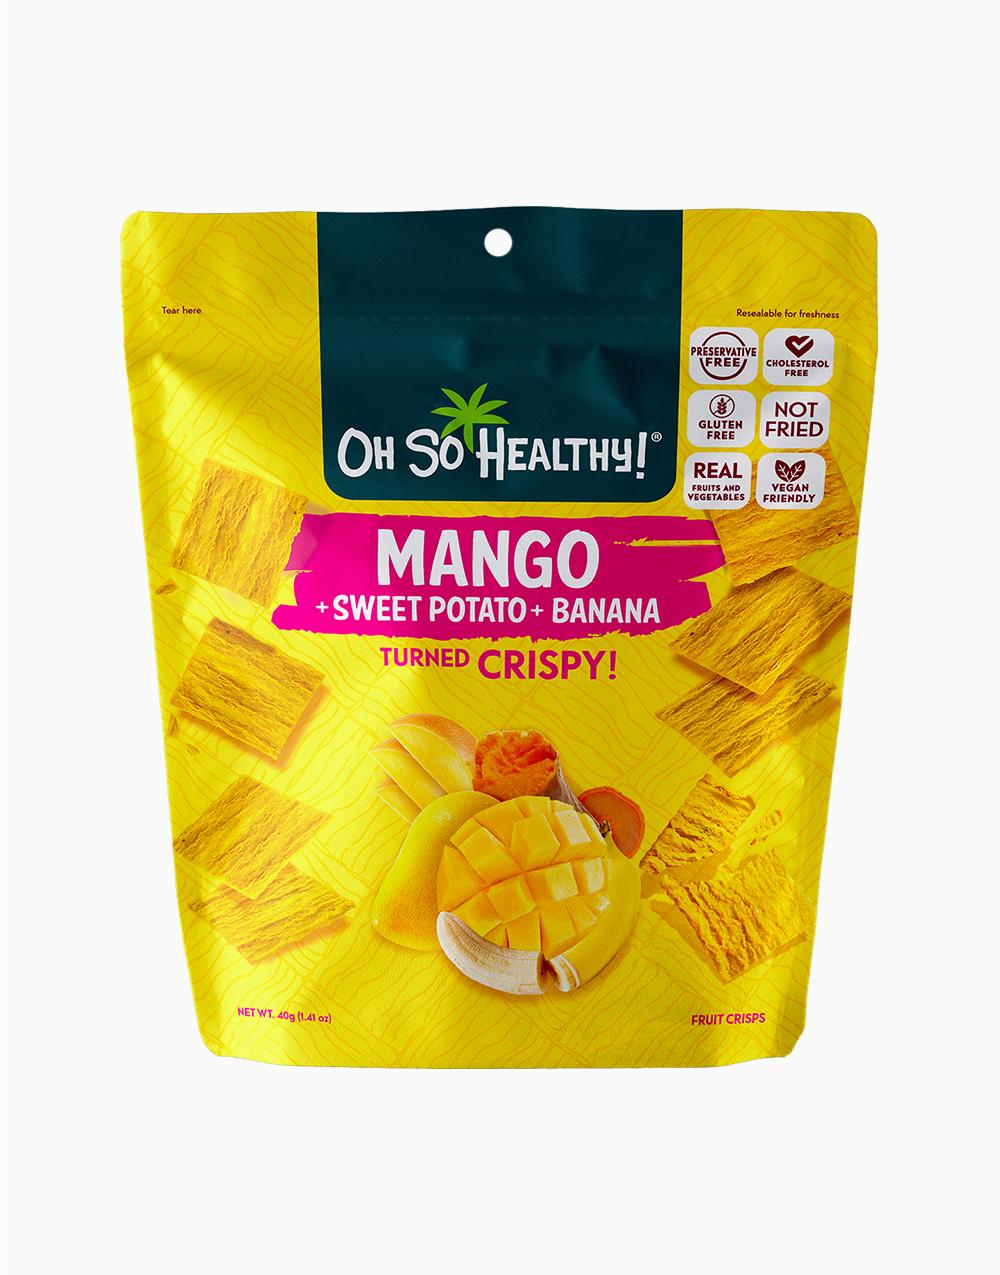 Mango Sweet Potato Banana Fruit Crisps by Oh So Healthy!